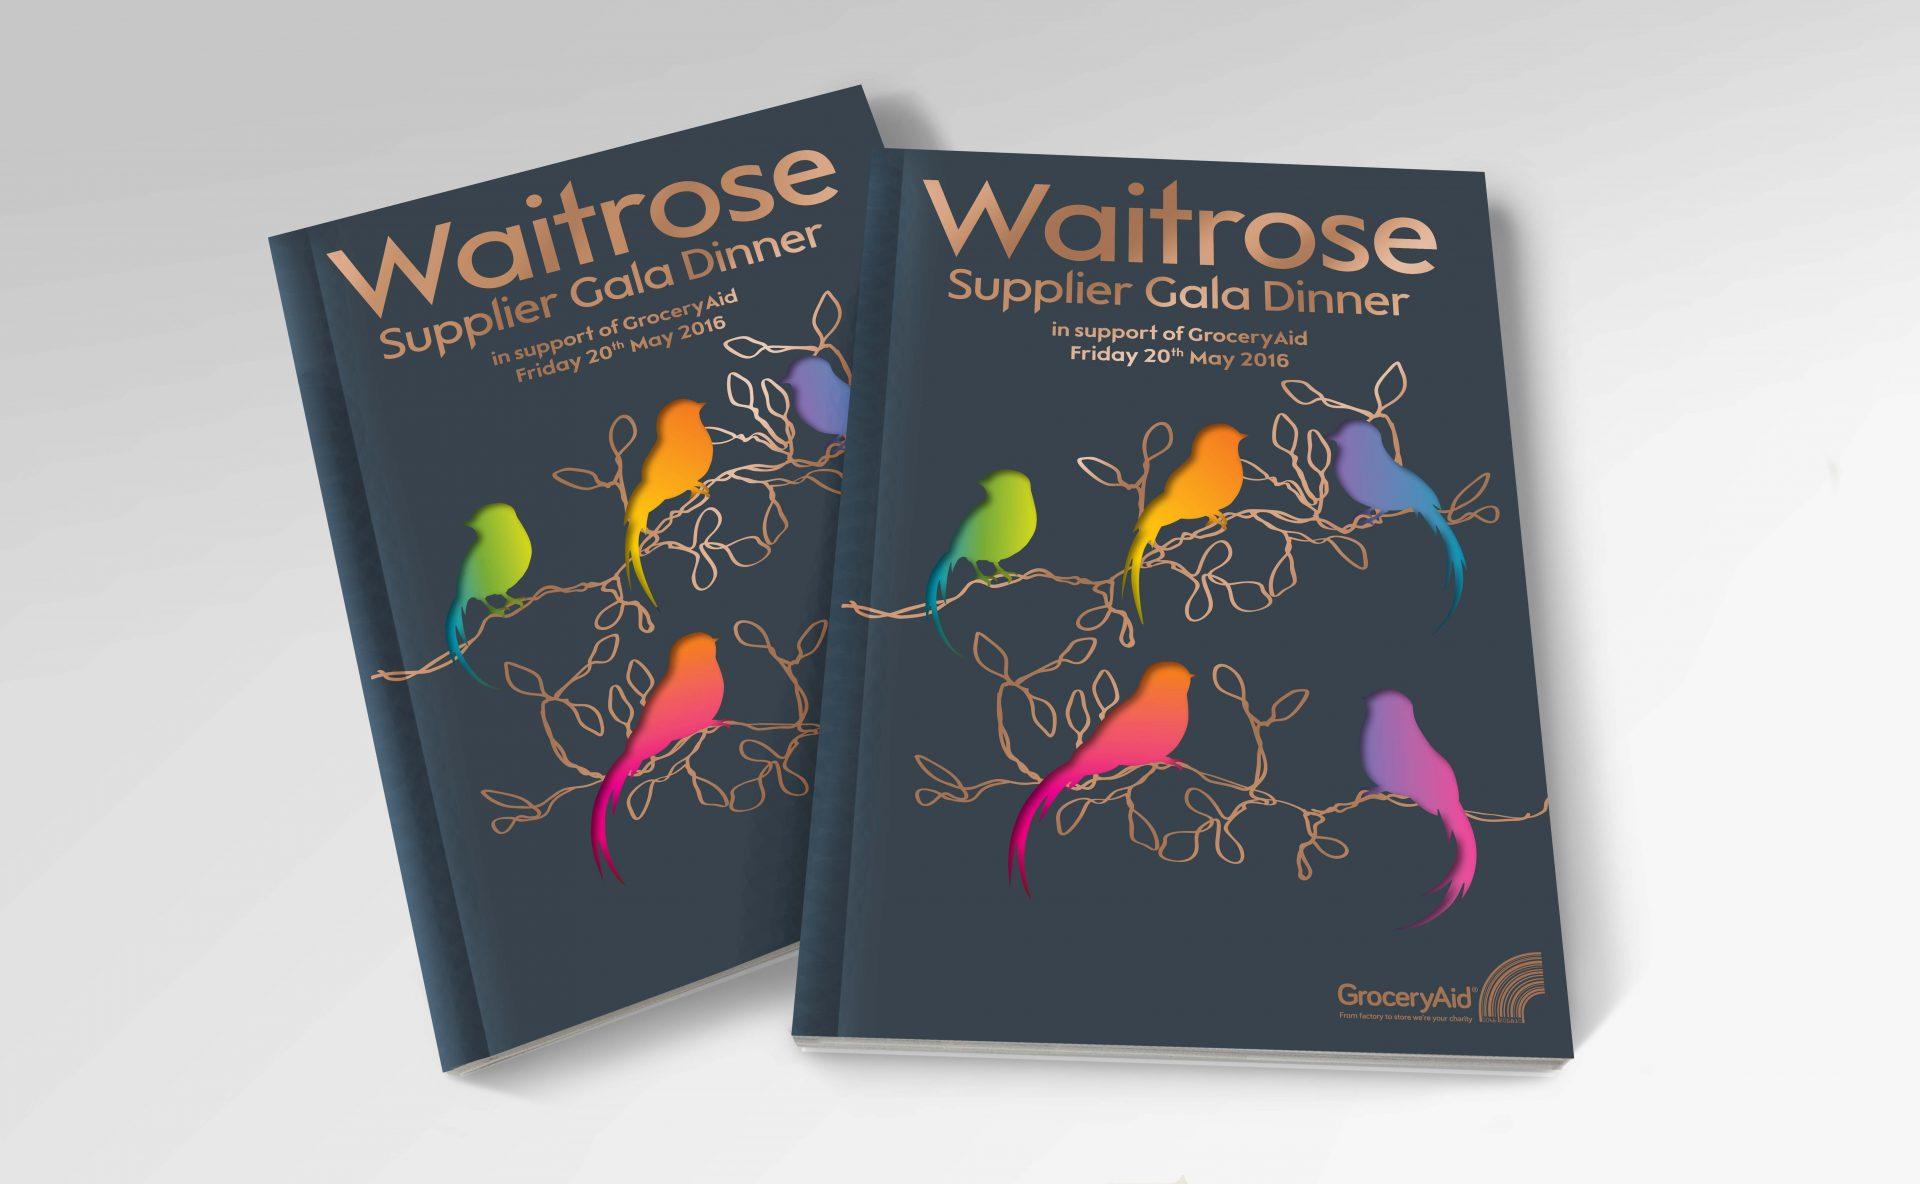 Waitrose-Programme-covers_By-nugget-Design_LR